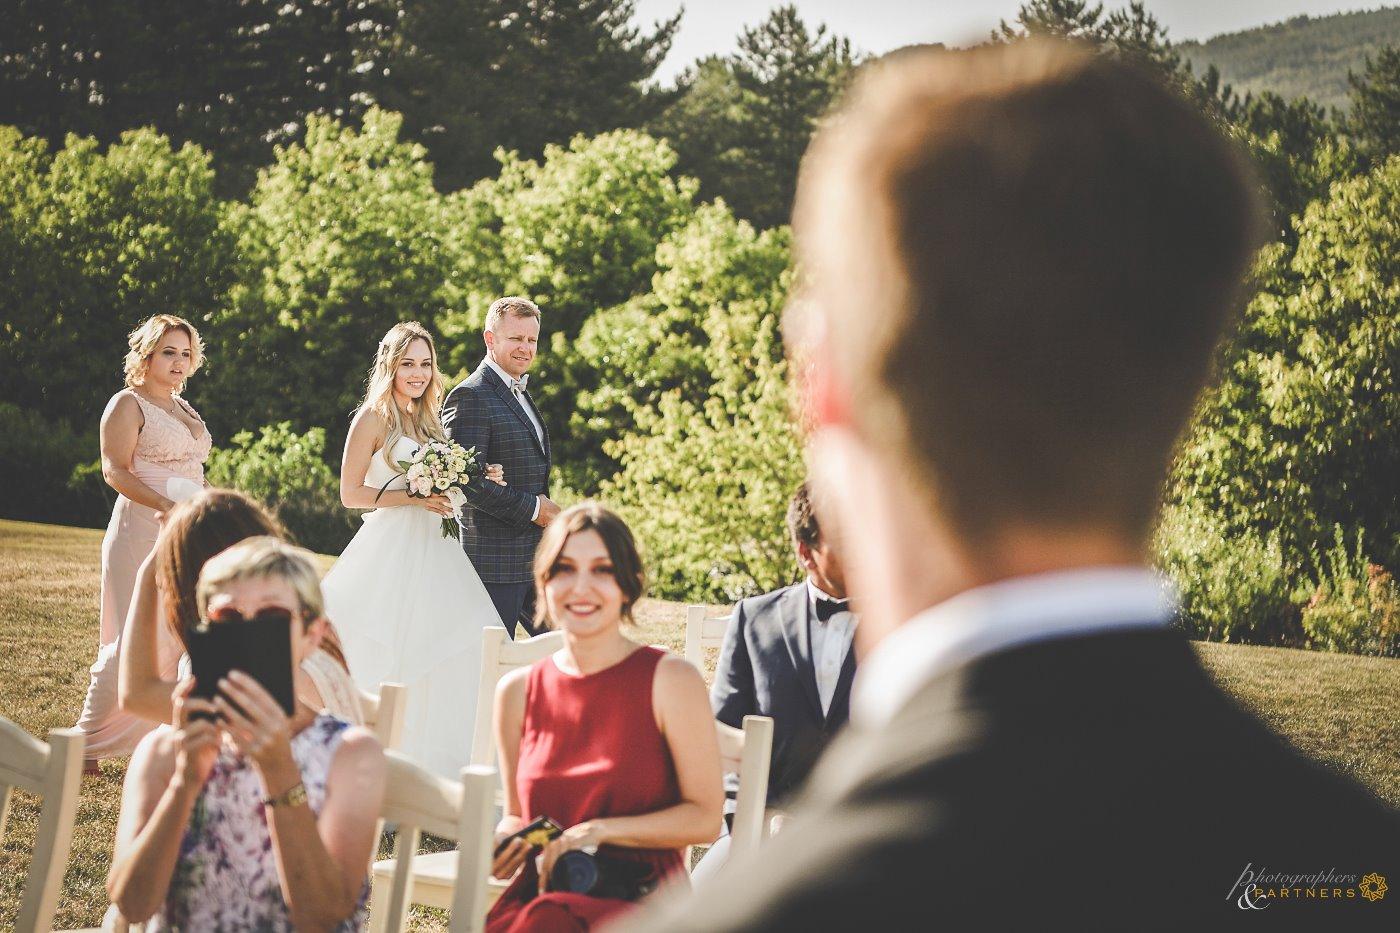 photographer_weddings_arezzo_06.jpg